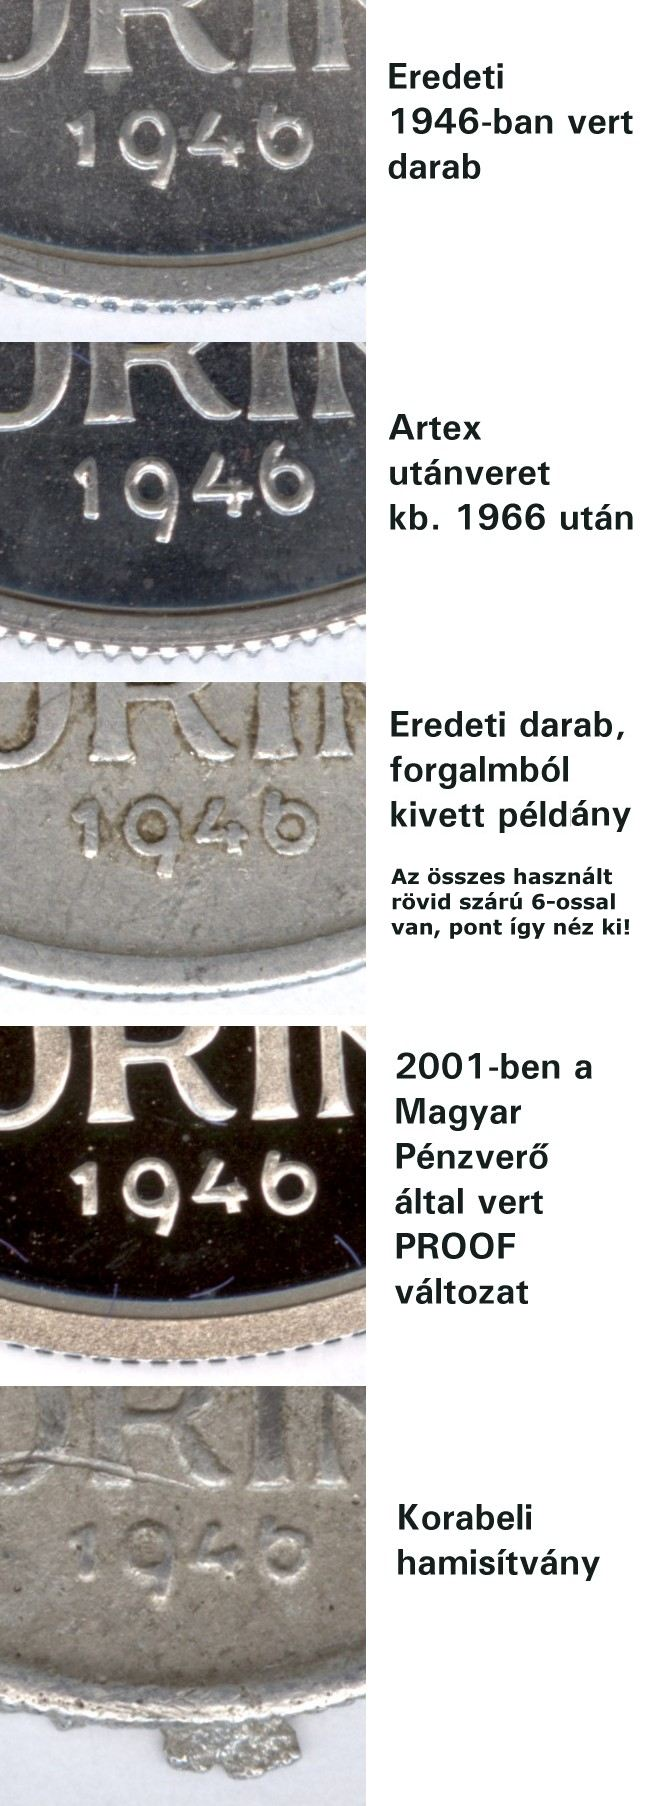 http://www.forintportal.hu/hirek/1946-os-2-forint-eredeti-es-az-artex-utanveret/1946-os-2-forint-eredeti-es-az-artex-utanveret_osszehasonlitas_nagy.jpg